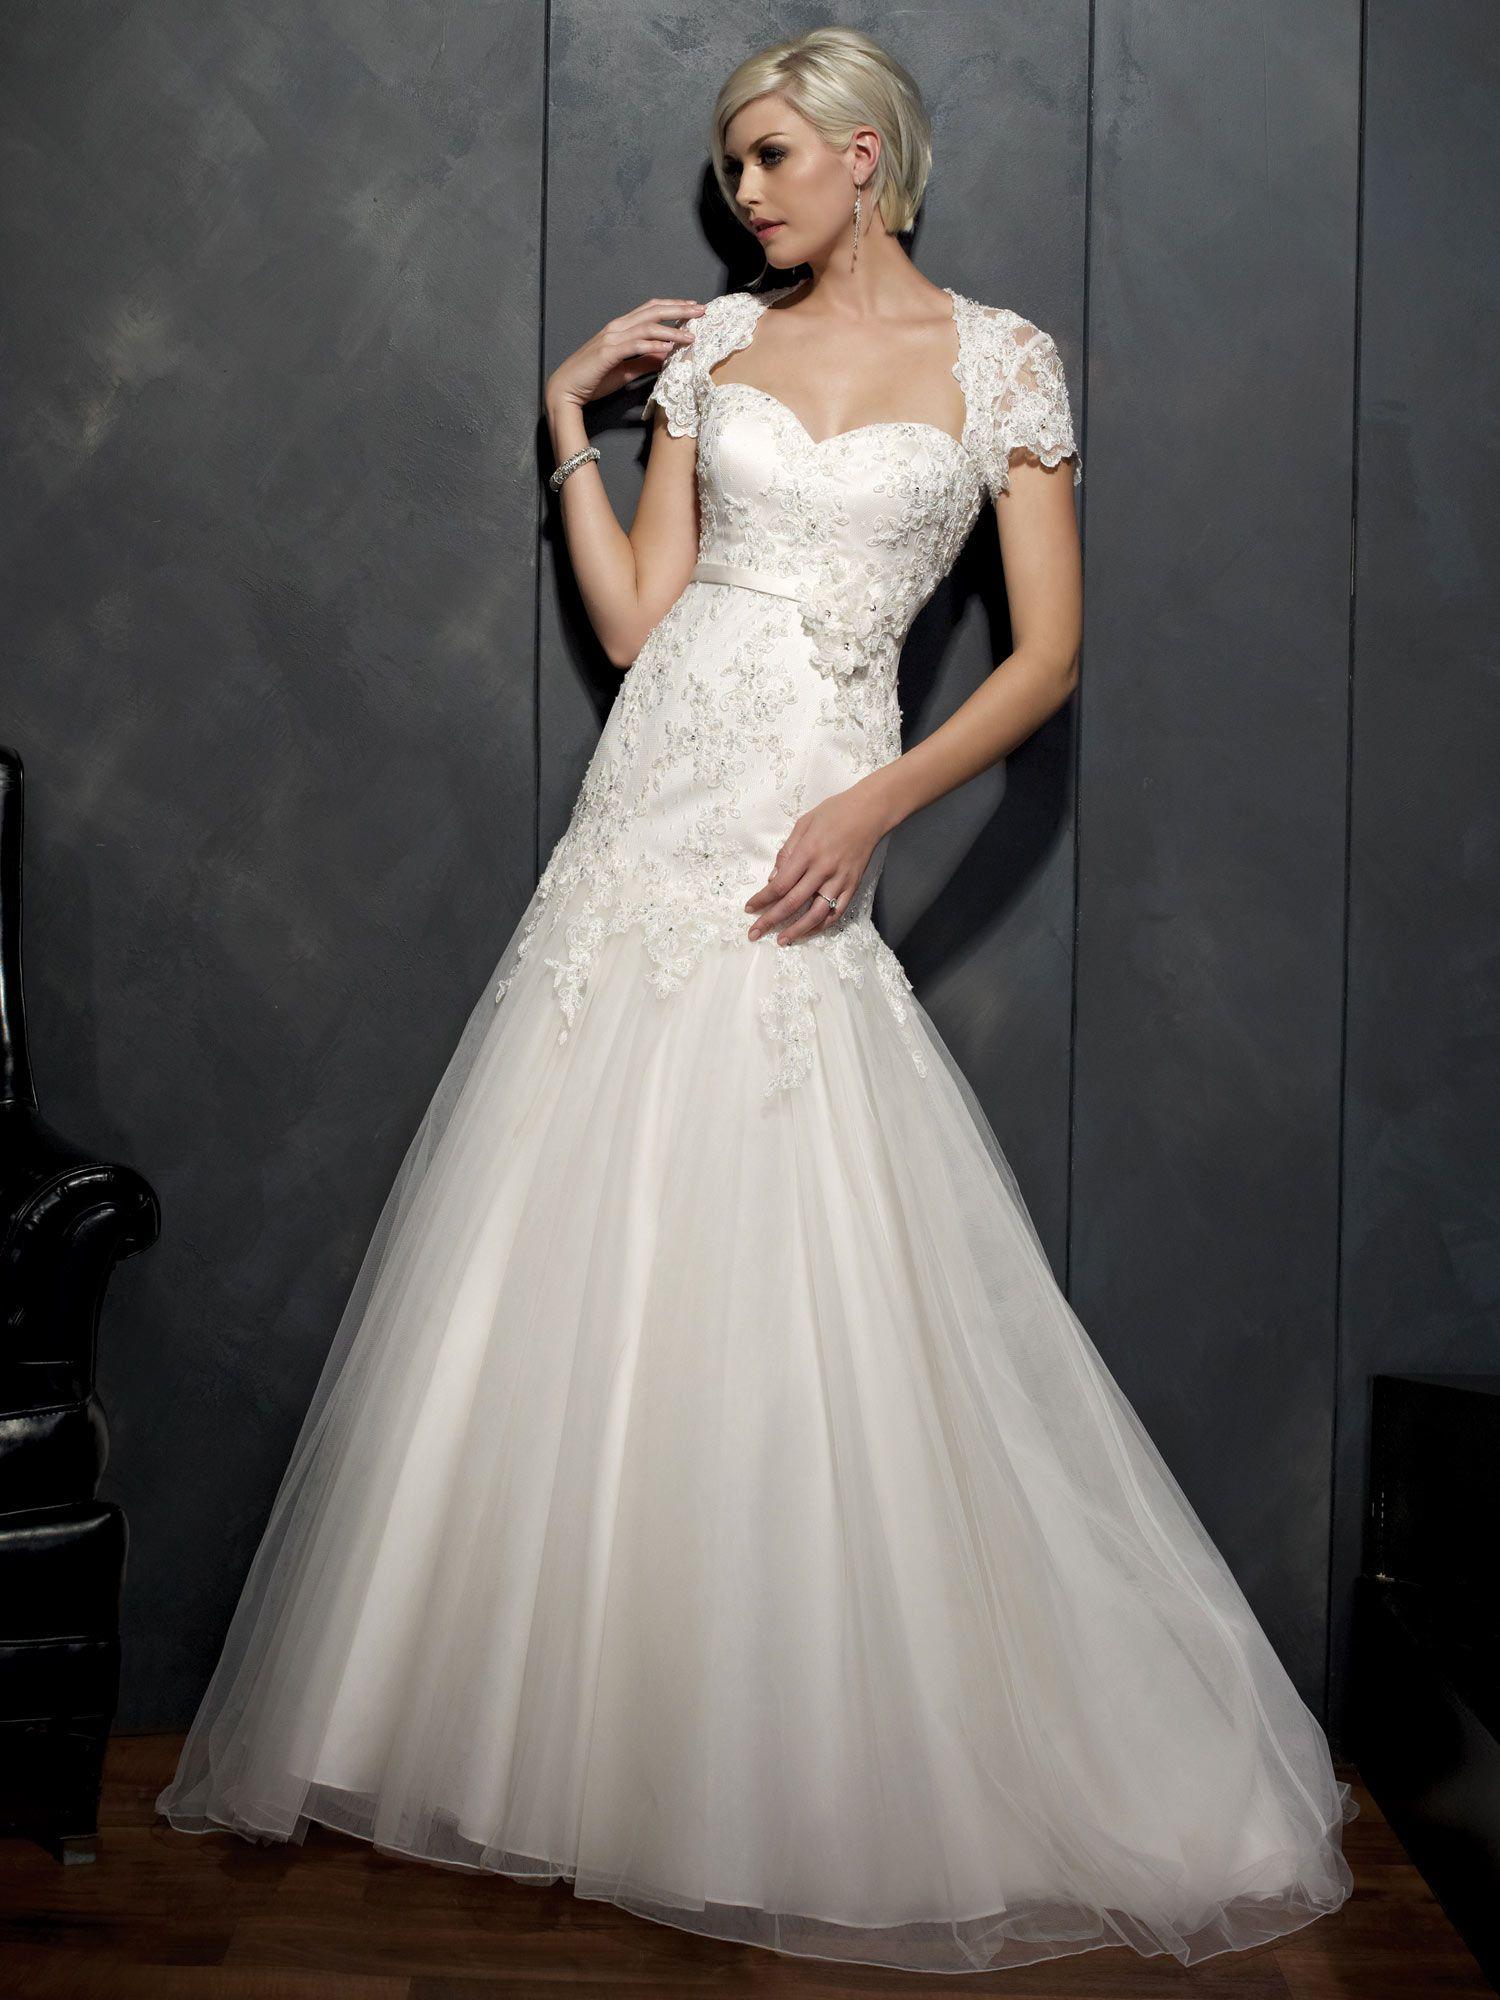 Kenneth Winston Private Label By G Style 1531 Available At Kaira S Bridal In Phoenix Az 602 749 1207 Www Kairasbridal Com Wedding Dresses Wedding Bridesmaid Dresses Wedding Dress Train